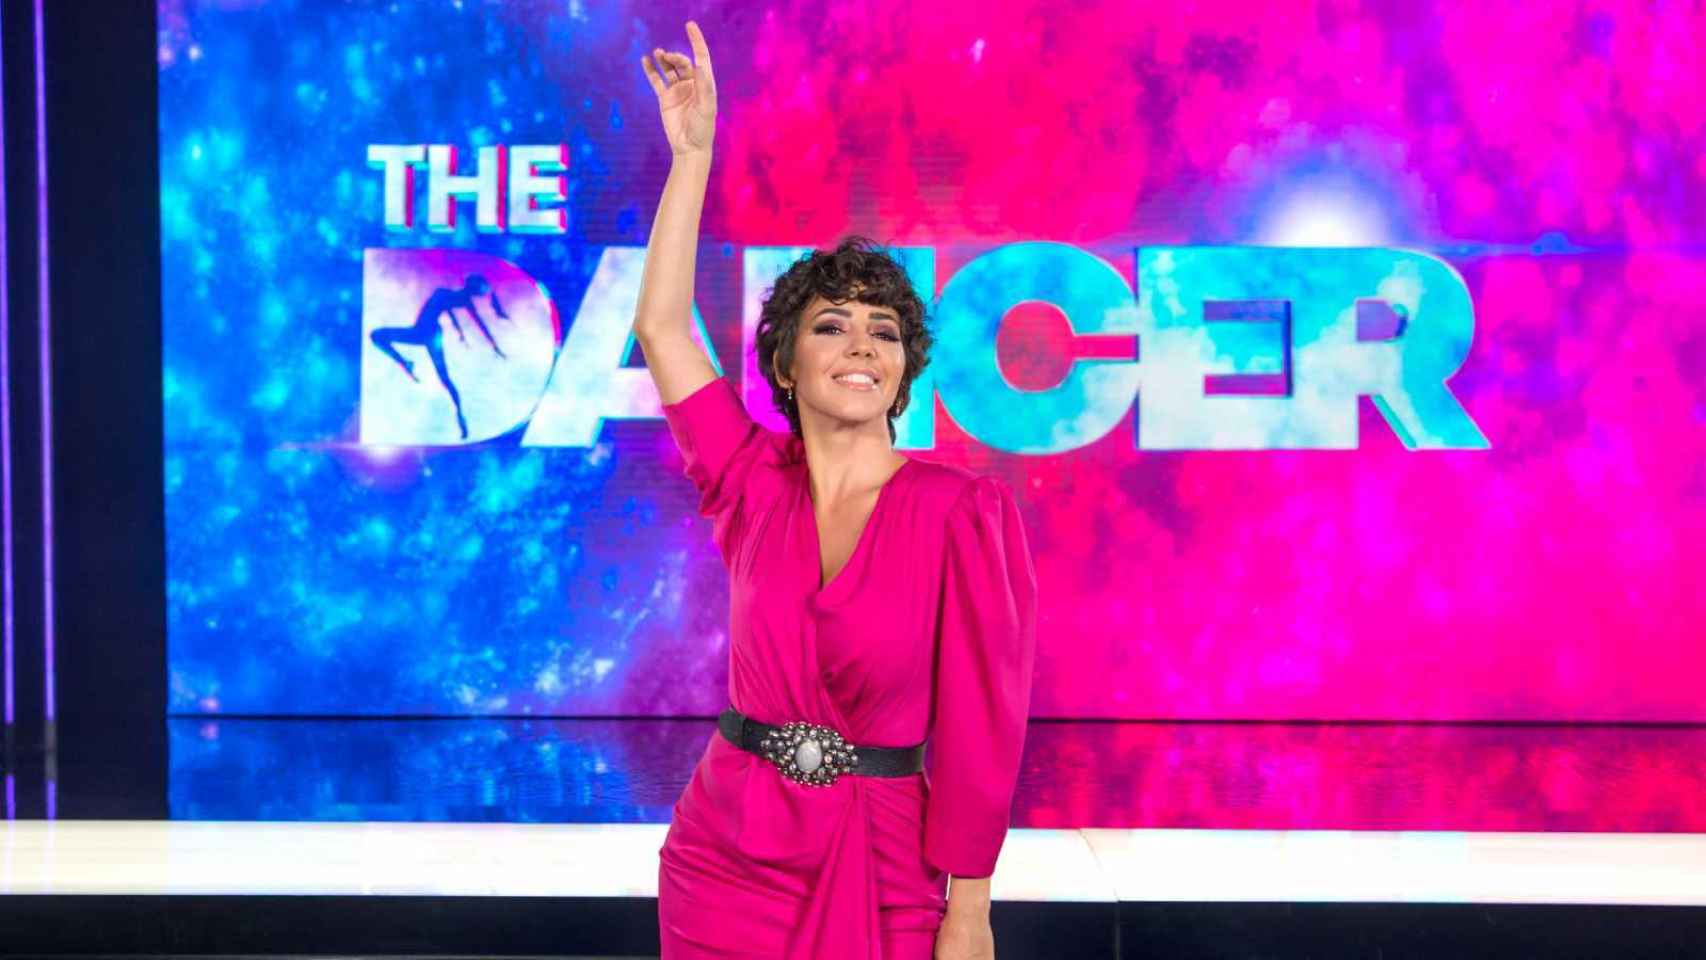 Sandra Cervera presentará 'The Dancer' junto a Ion Aramendi.